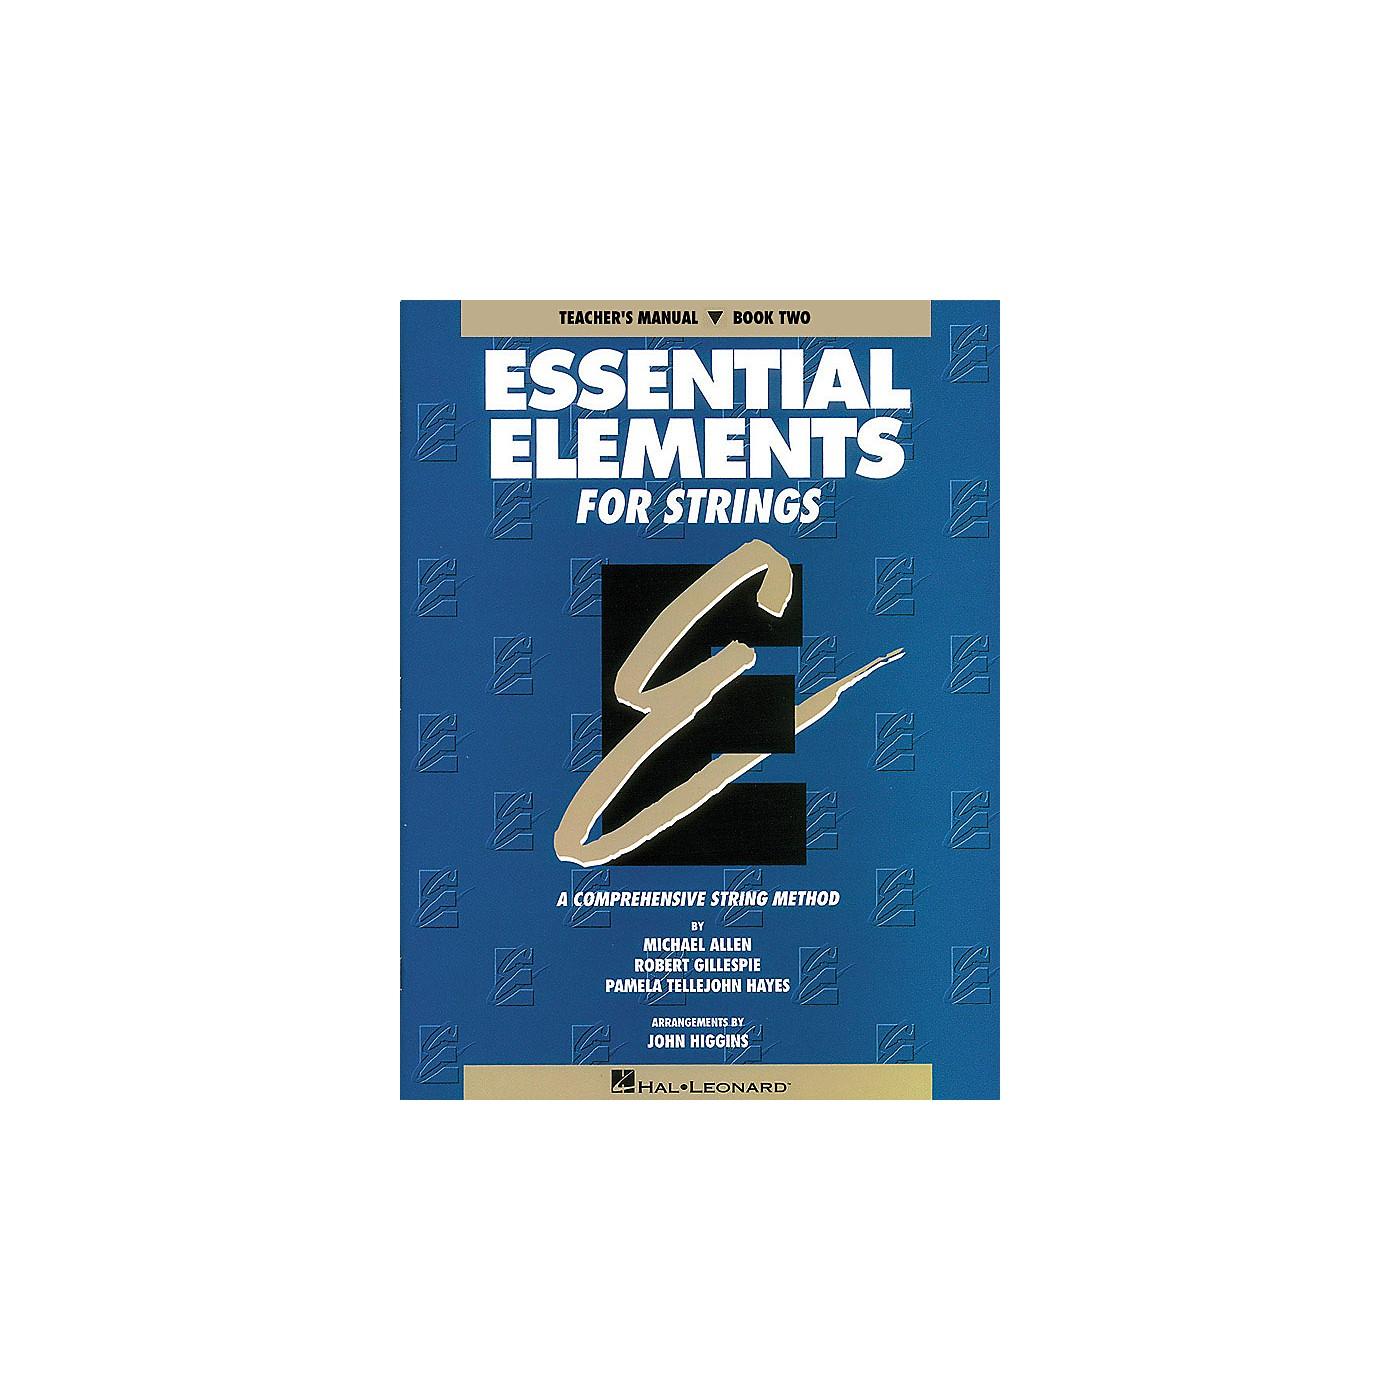 Hal Leonard Essential Elements for Strings - Book 2 (Original Series) Essential Elements Series Softcover thumbnail